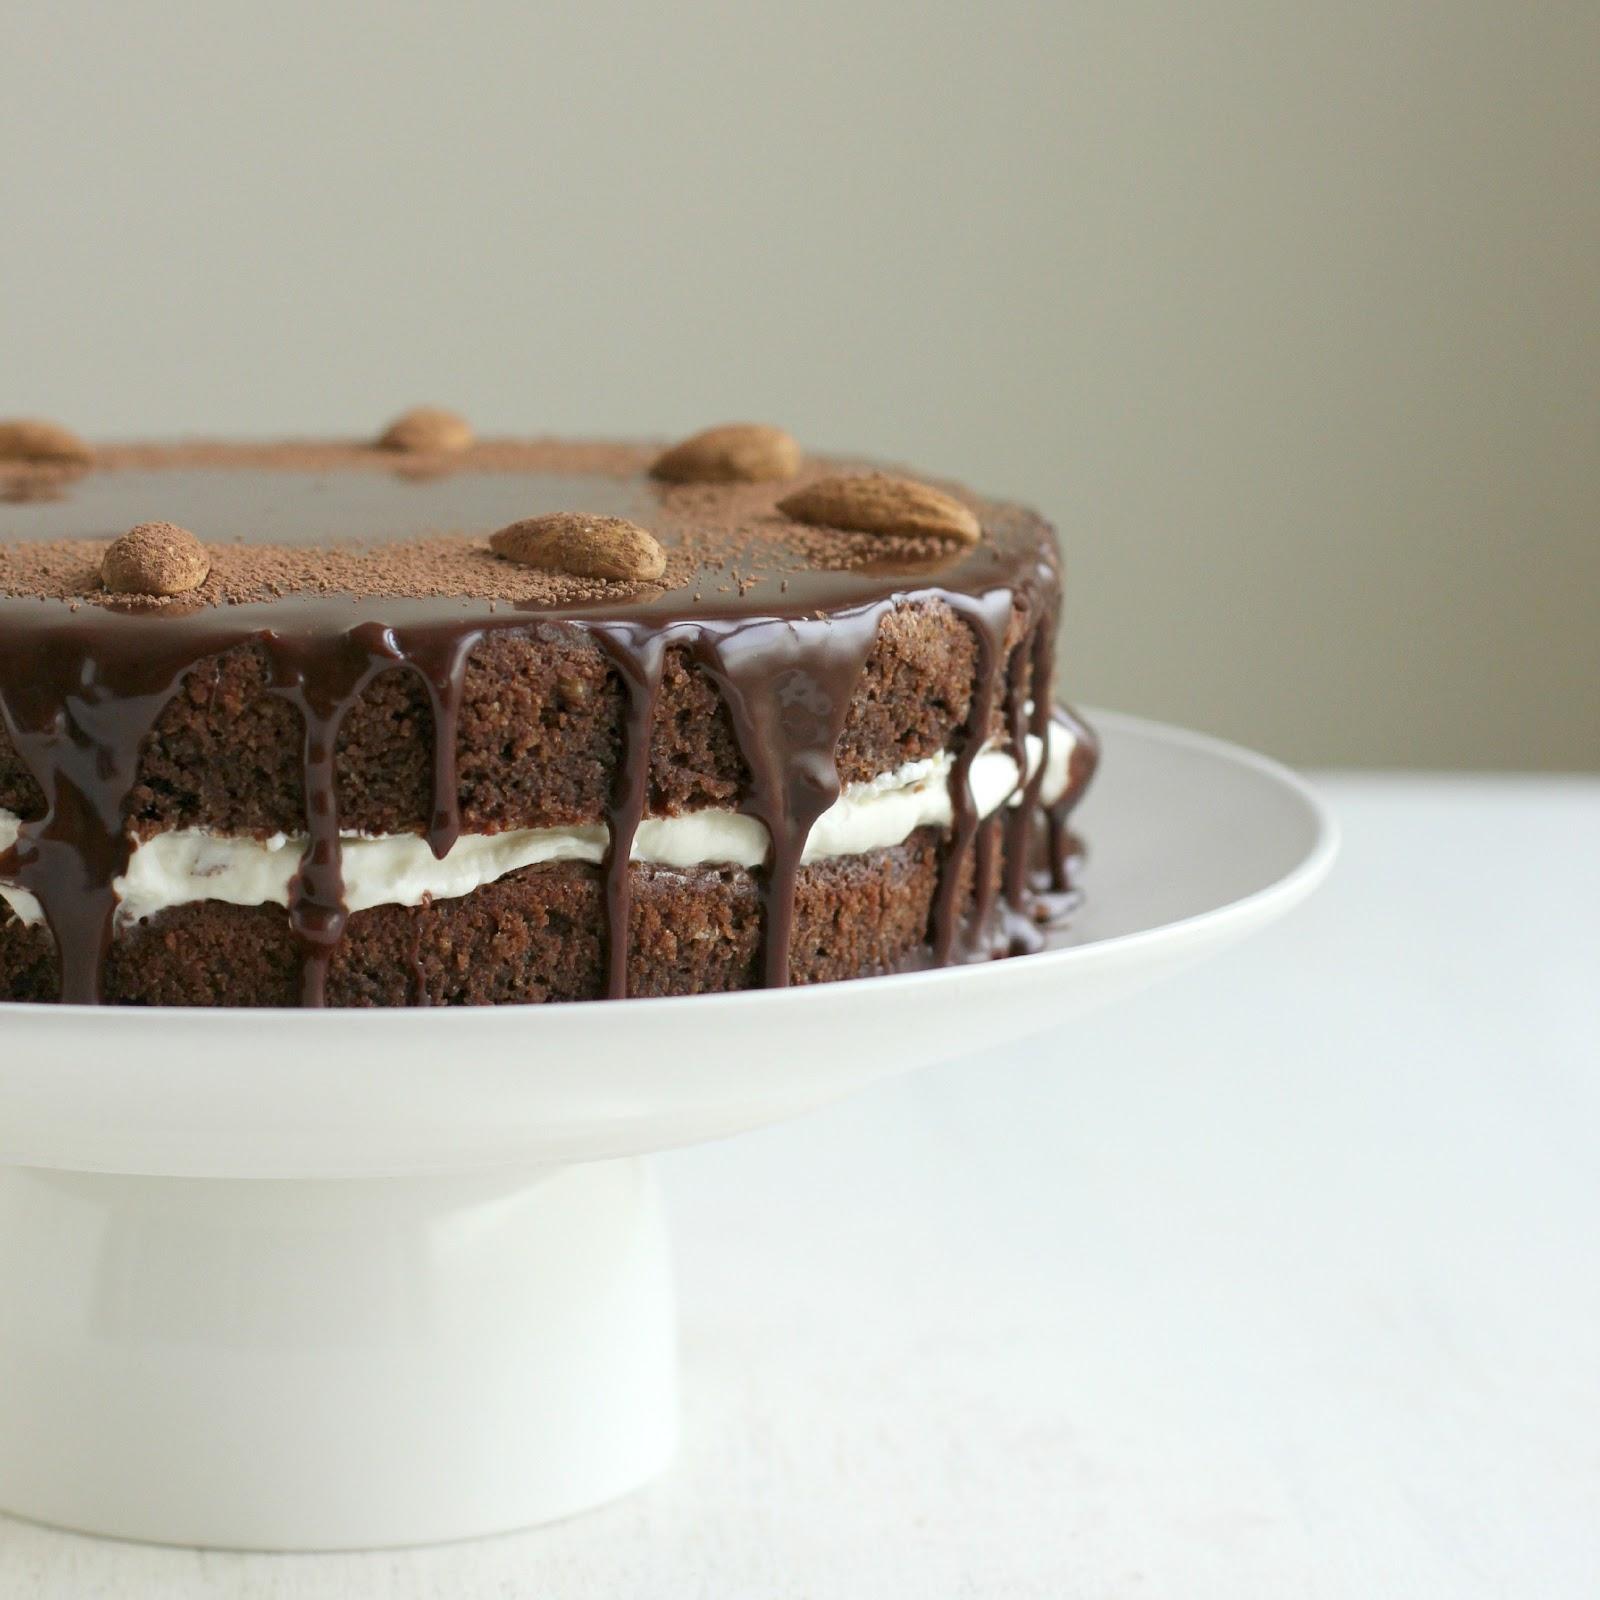 Gluten Free Chocolate Almond Cake Recipe Reine De Saba My Darling Lemon Thyme